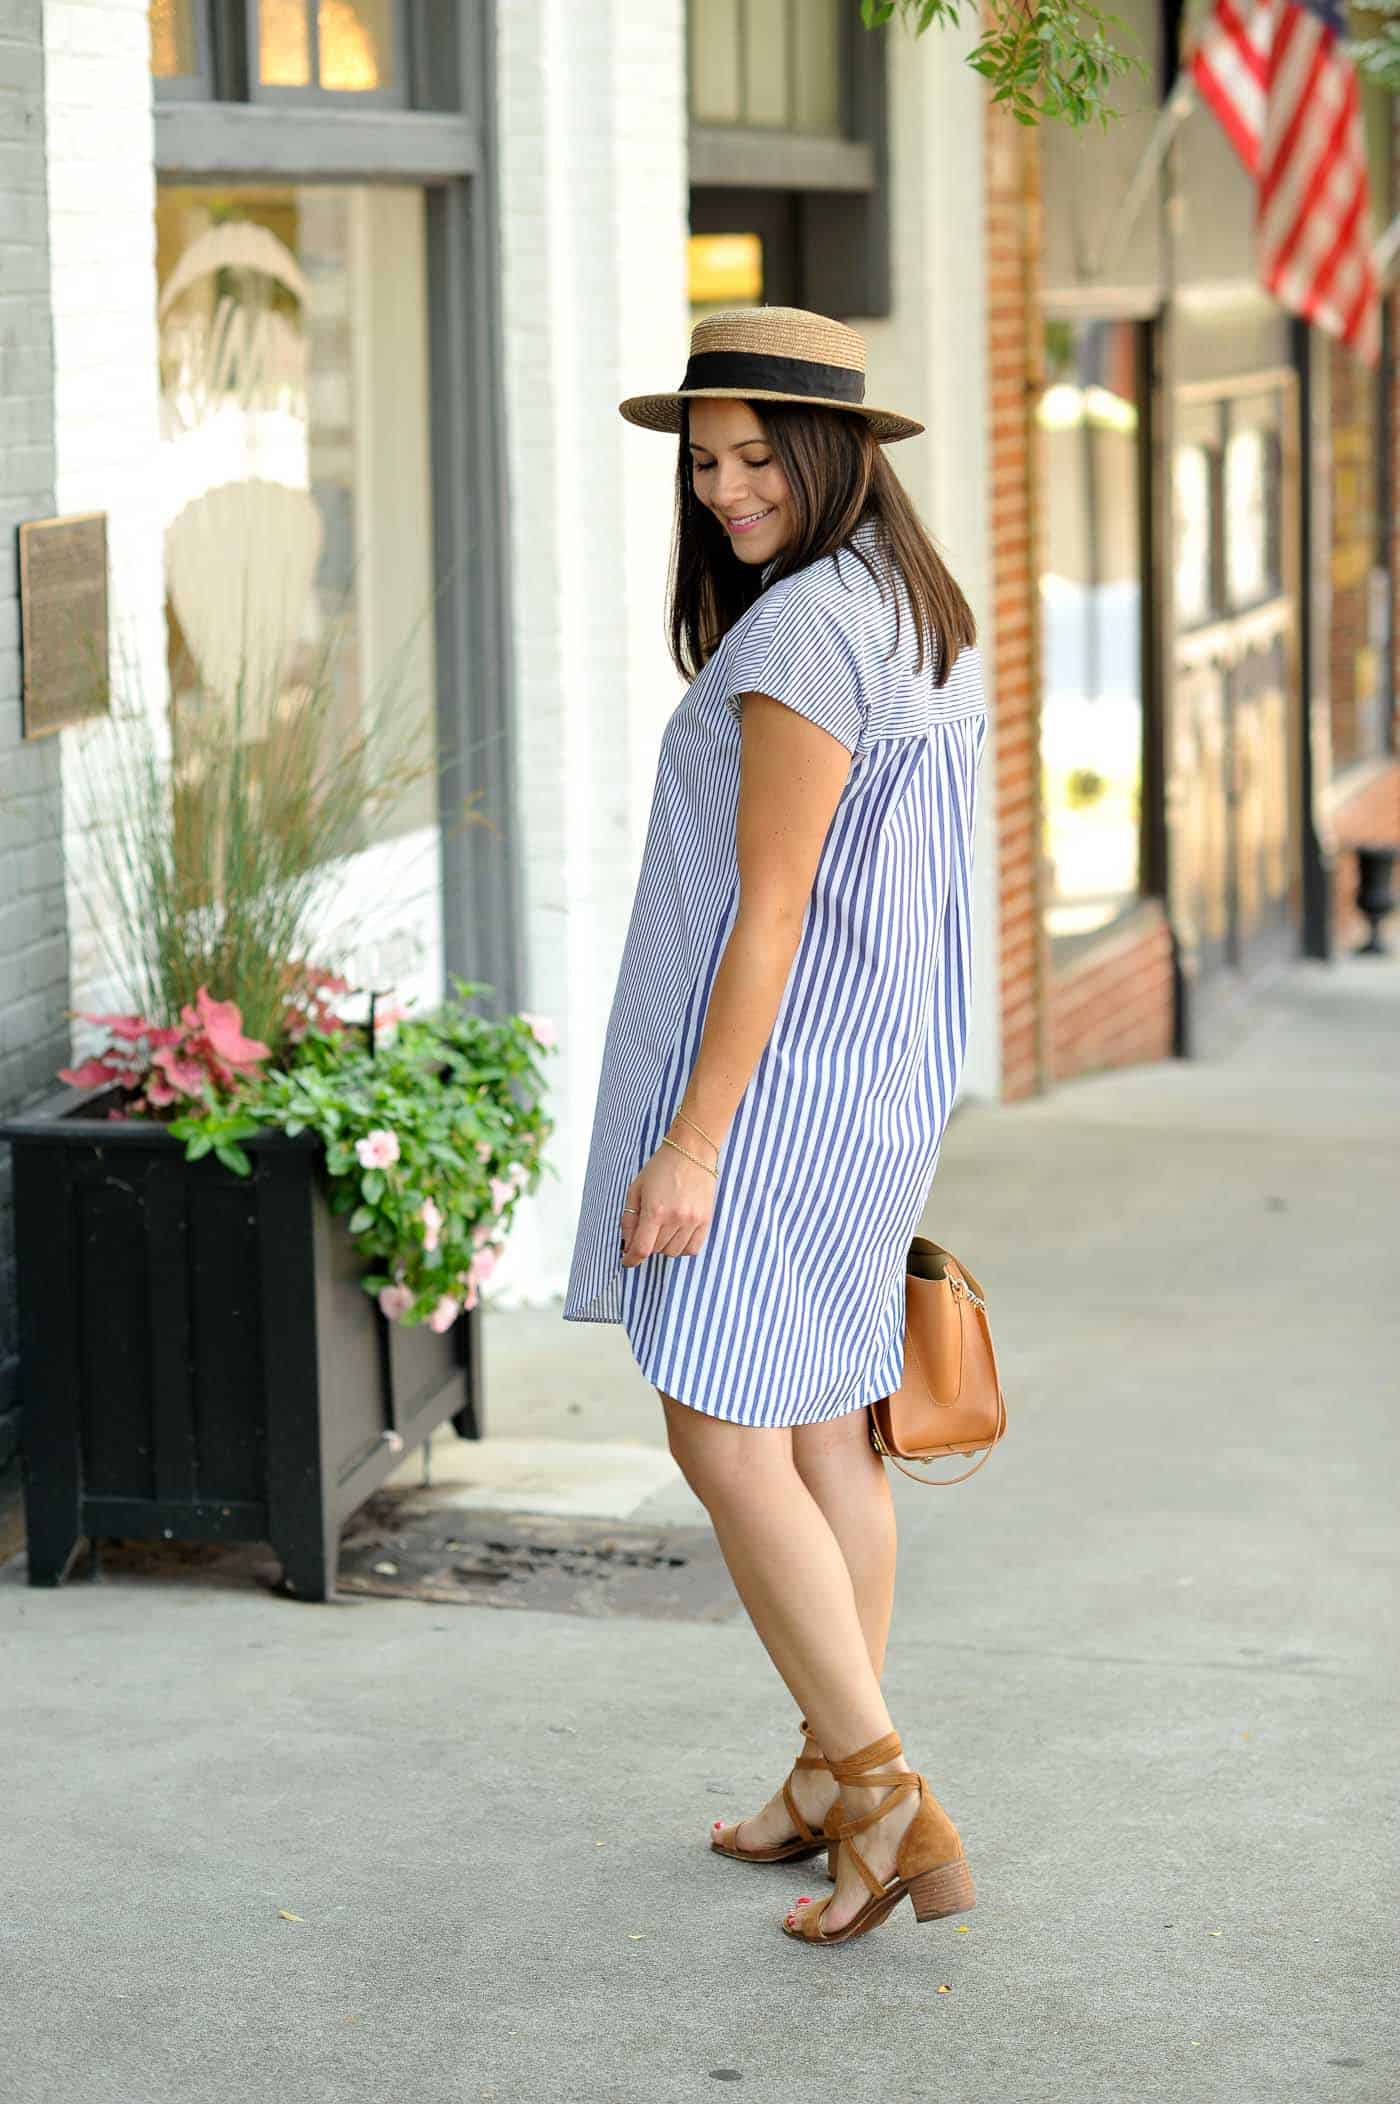 eeeccc81321 Madewell Striped Shirt Dress • Lace Up Sandals • Hat • Zac Zac Posen Bag